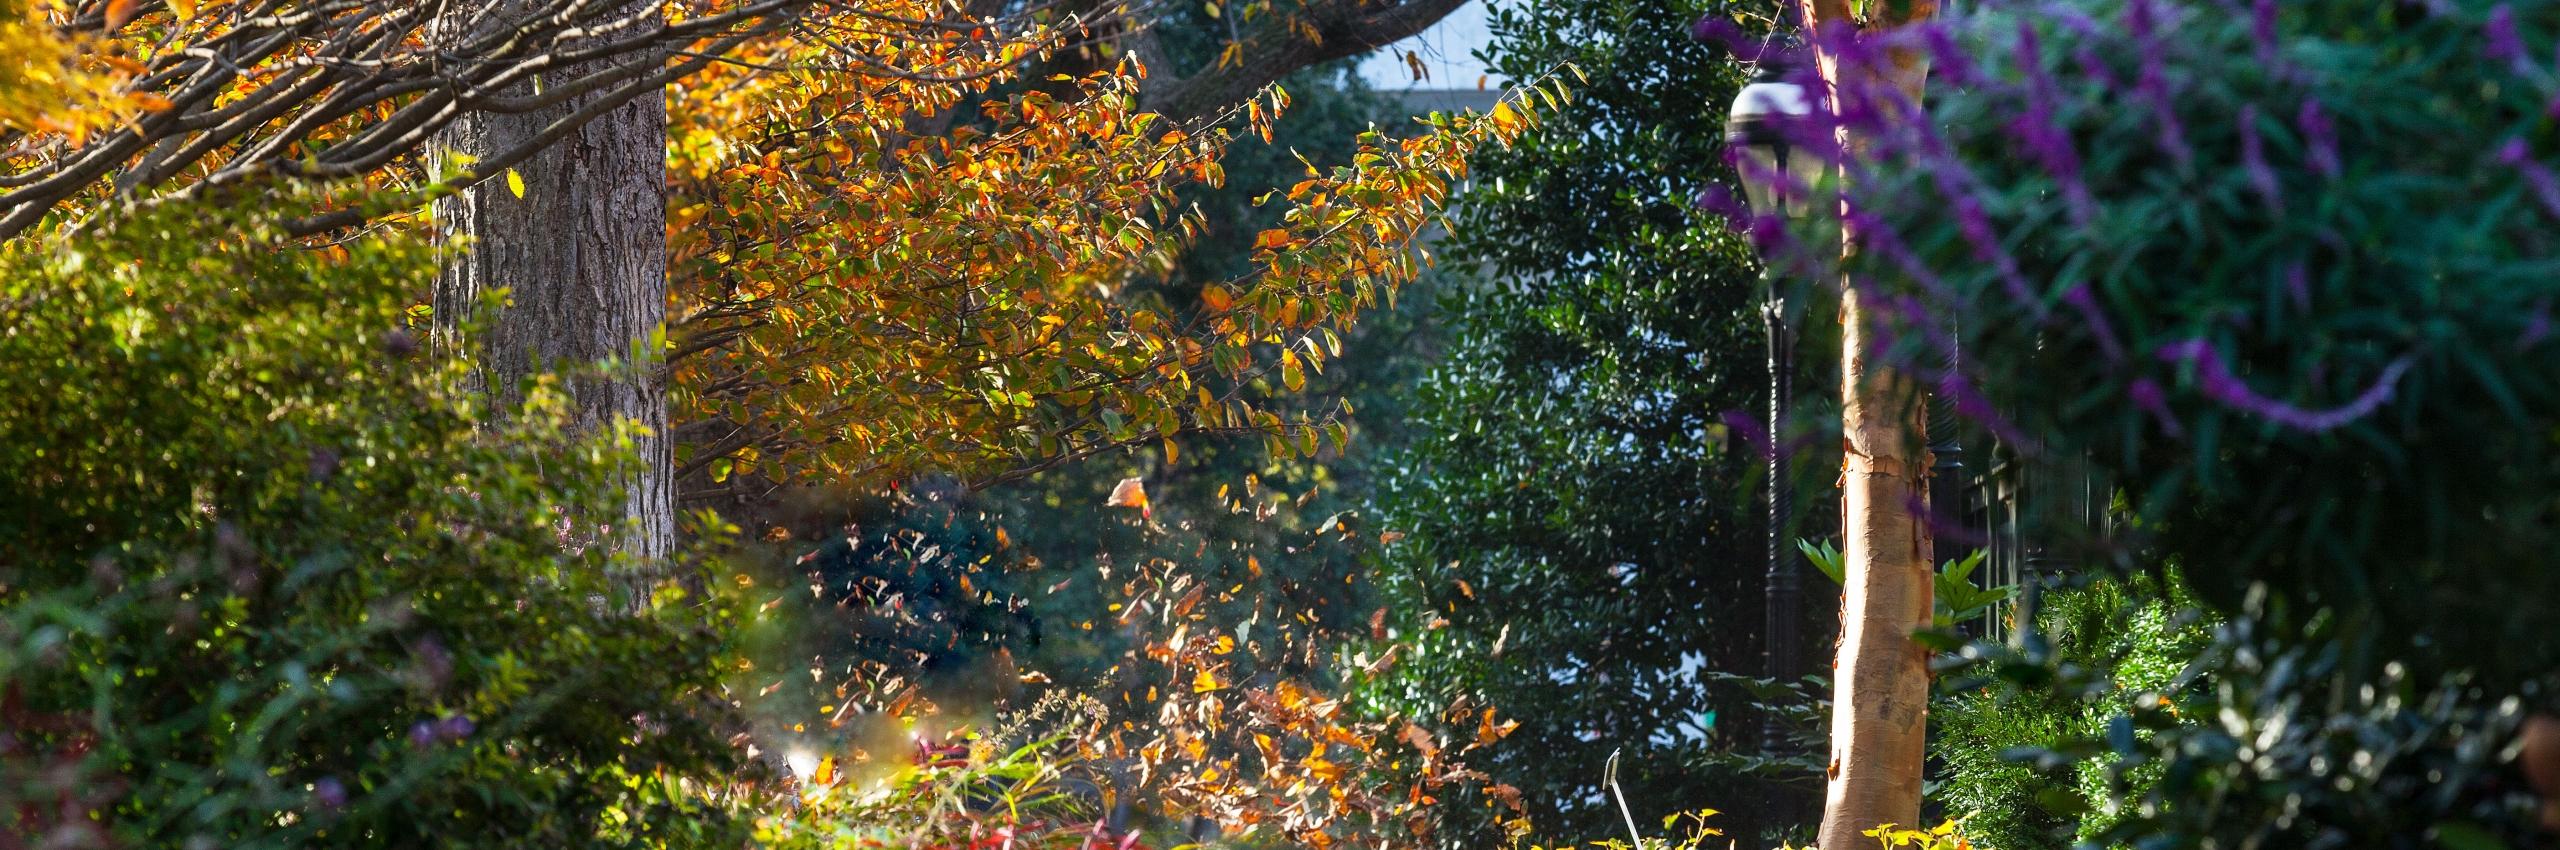 view of fall garden